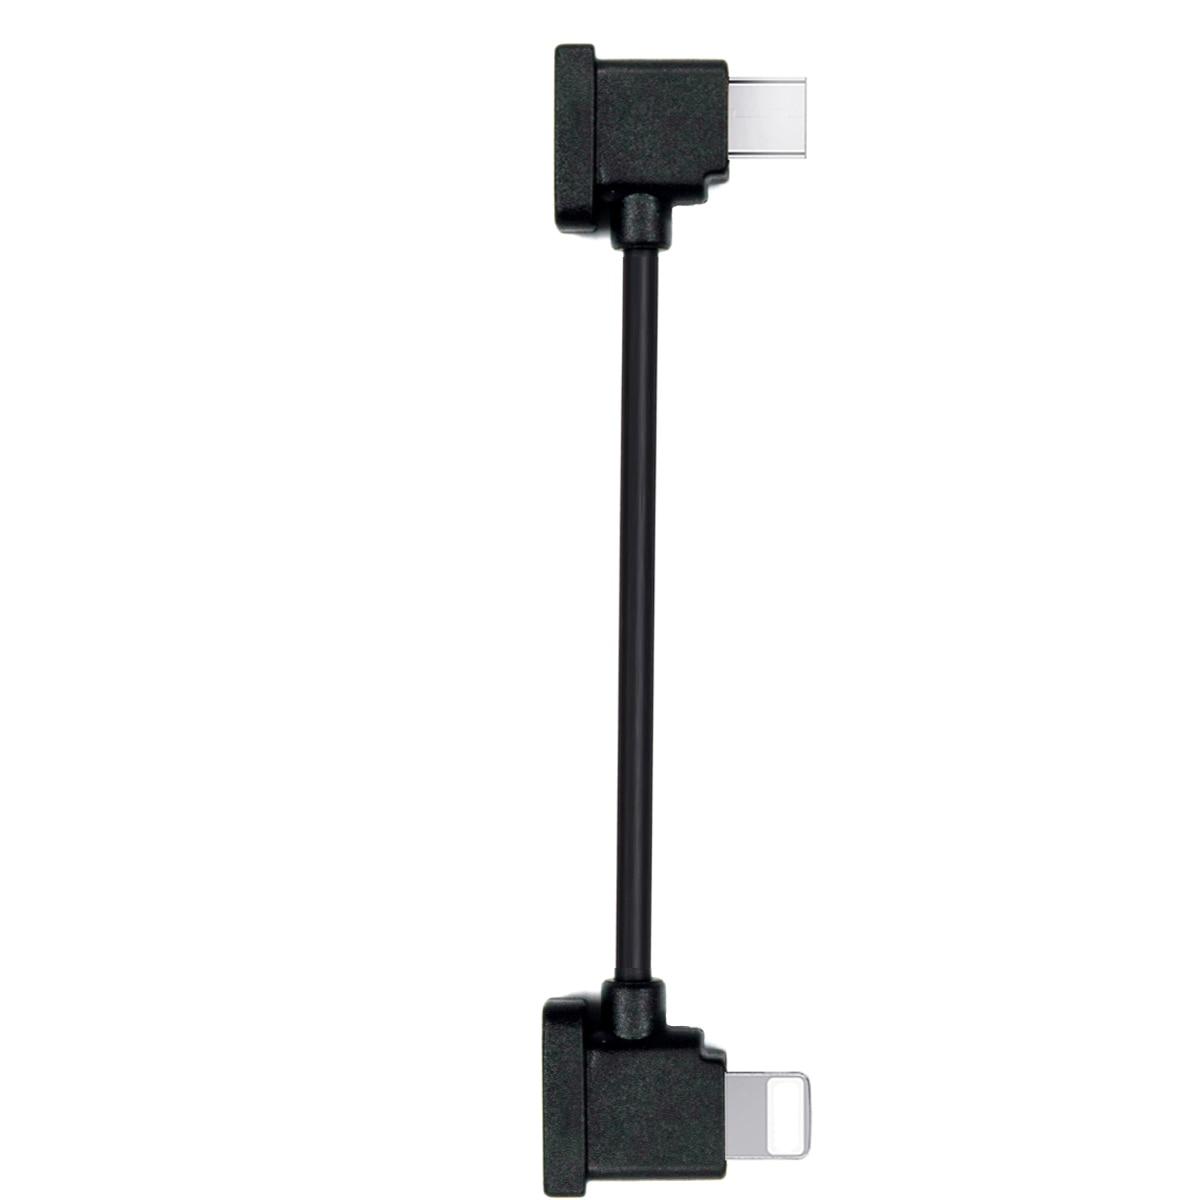 30Cm 15Cm Mavic Air2/Mini2 Kabel Drone Afstandsbediening Micro Type-C Ios Android Datakabel tablet Lijn Draad Voor Dji Fpv 5